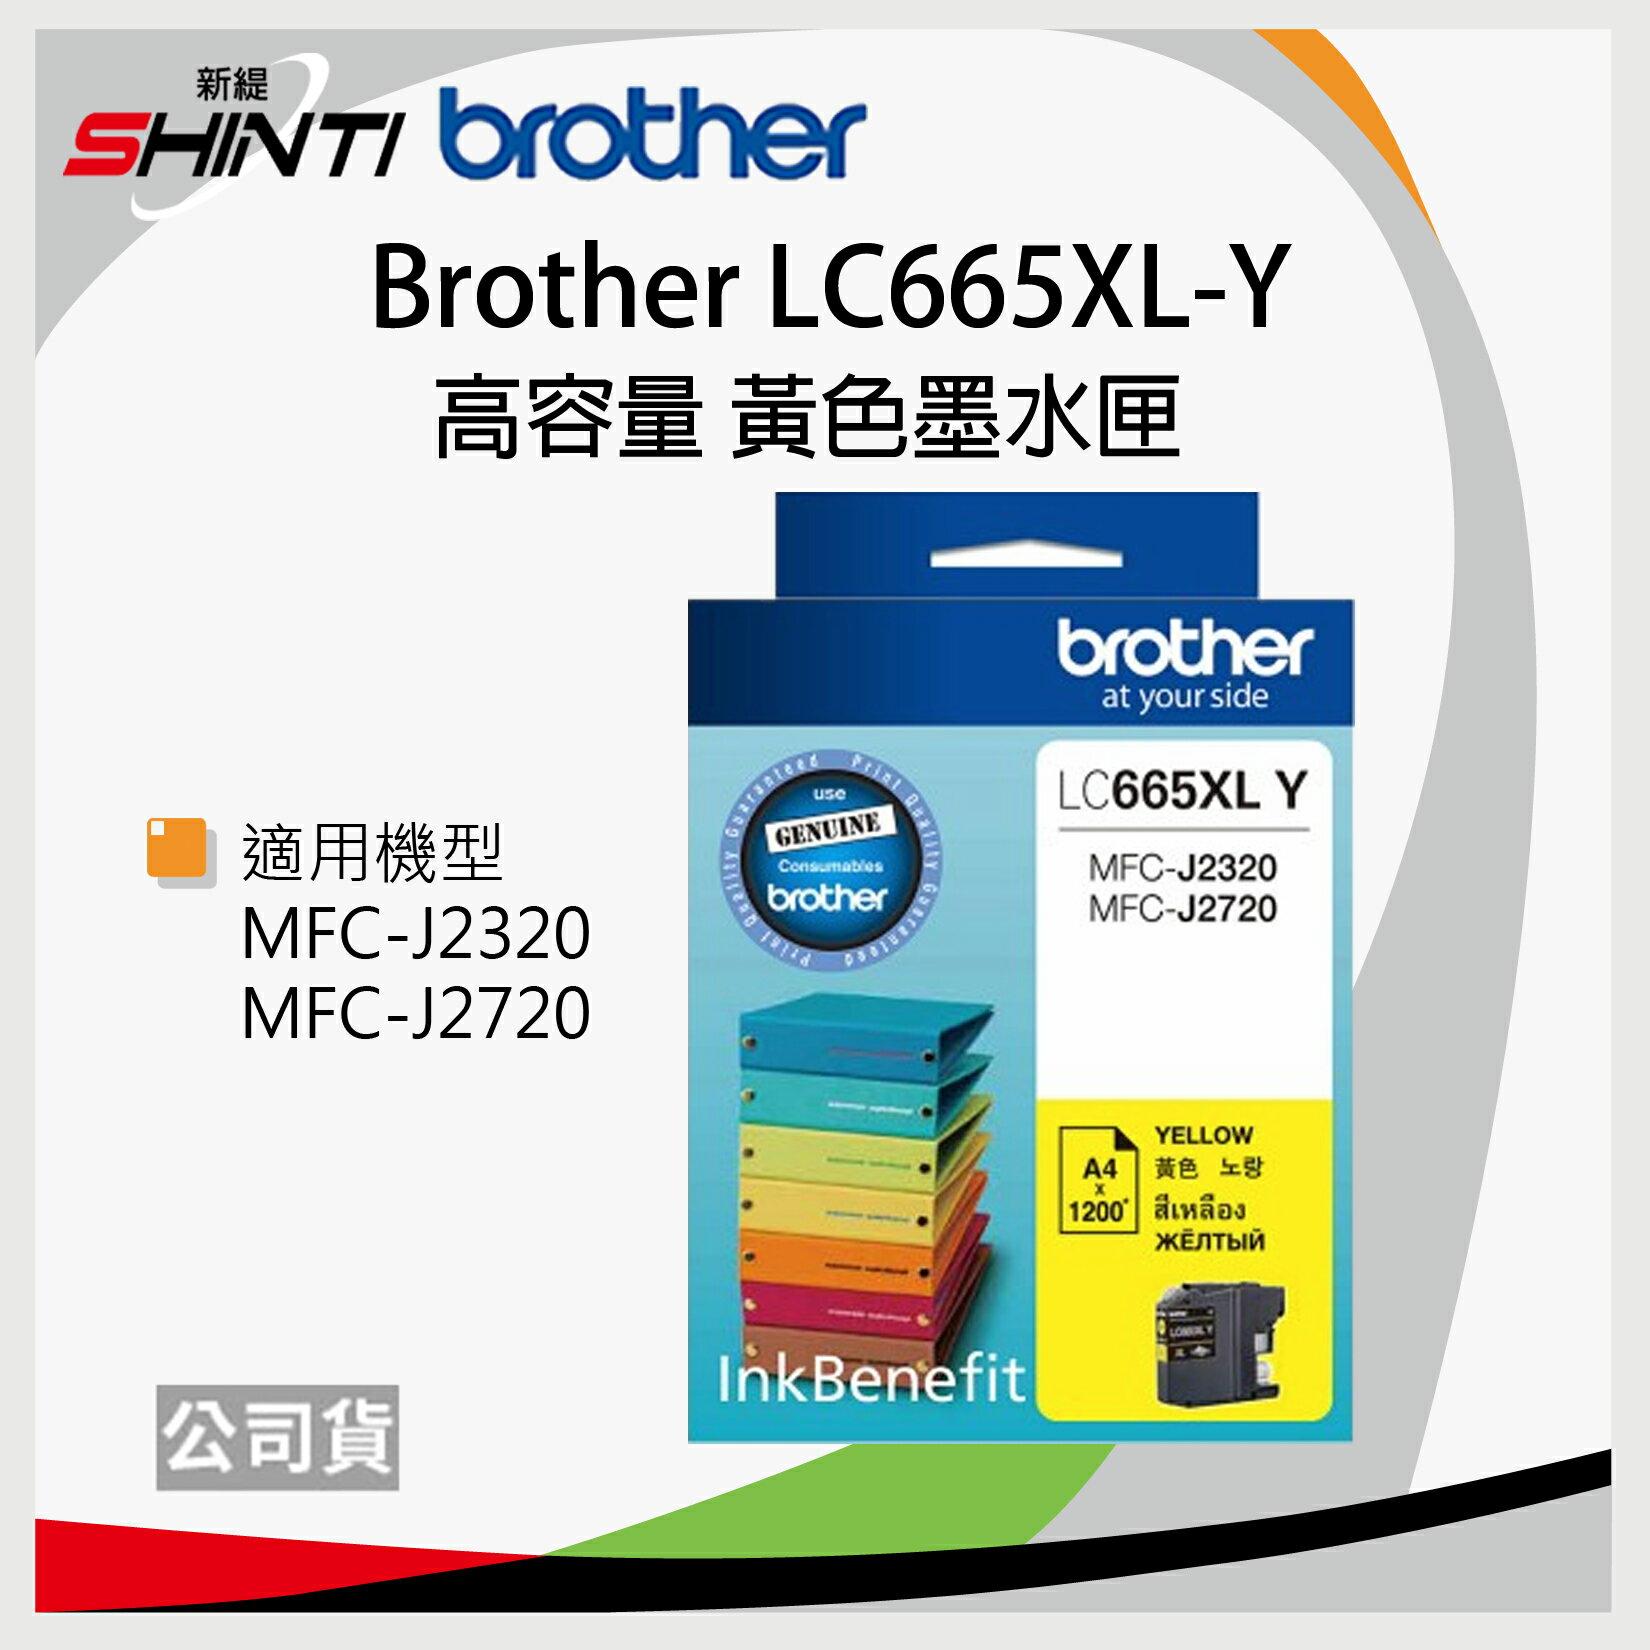 brother LC-665XL - Y黃色 原廠彩色高容量墨水匣 - ( 適MFC-J2320,MFC-J2720 )